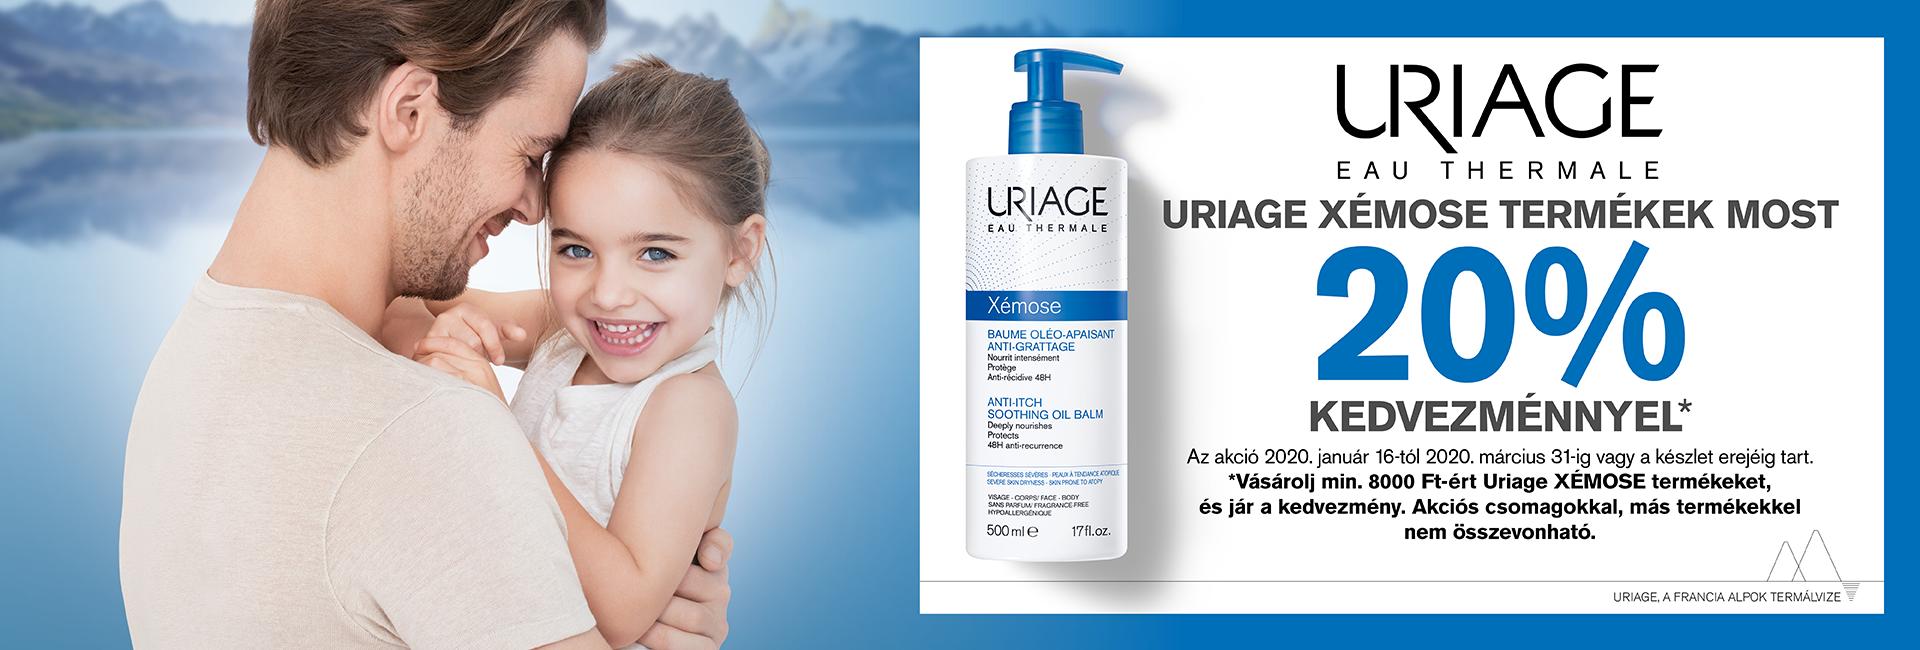 2020. március 31-ig minden Uriage Xémose termékre 20% kedvezményt adunk!